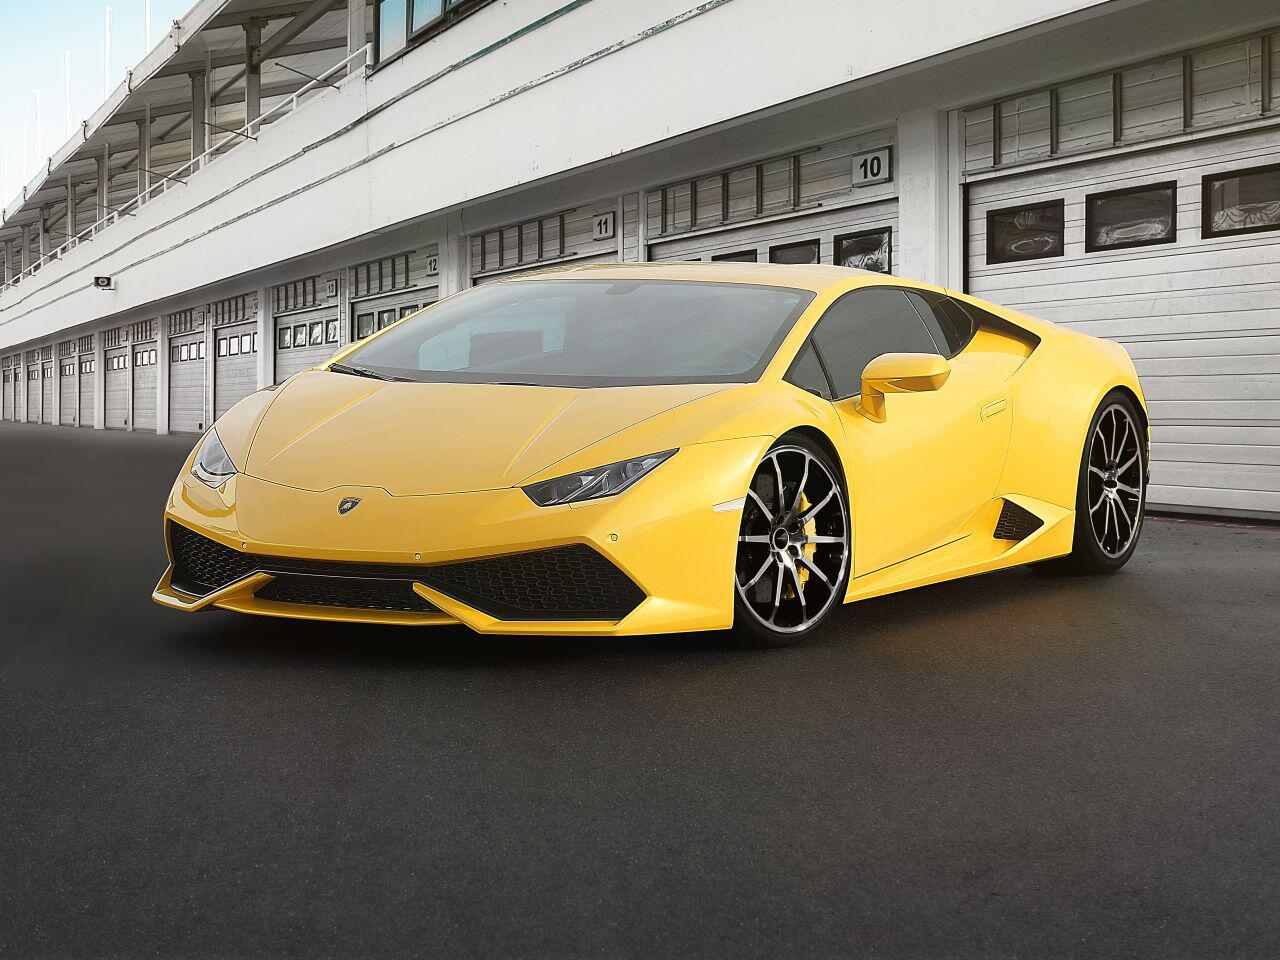 Bild zu Lamborghini Huracan Mansory